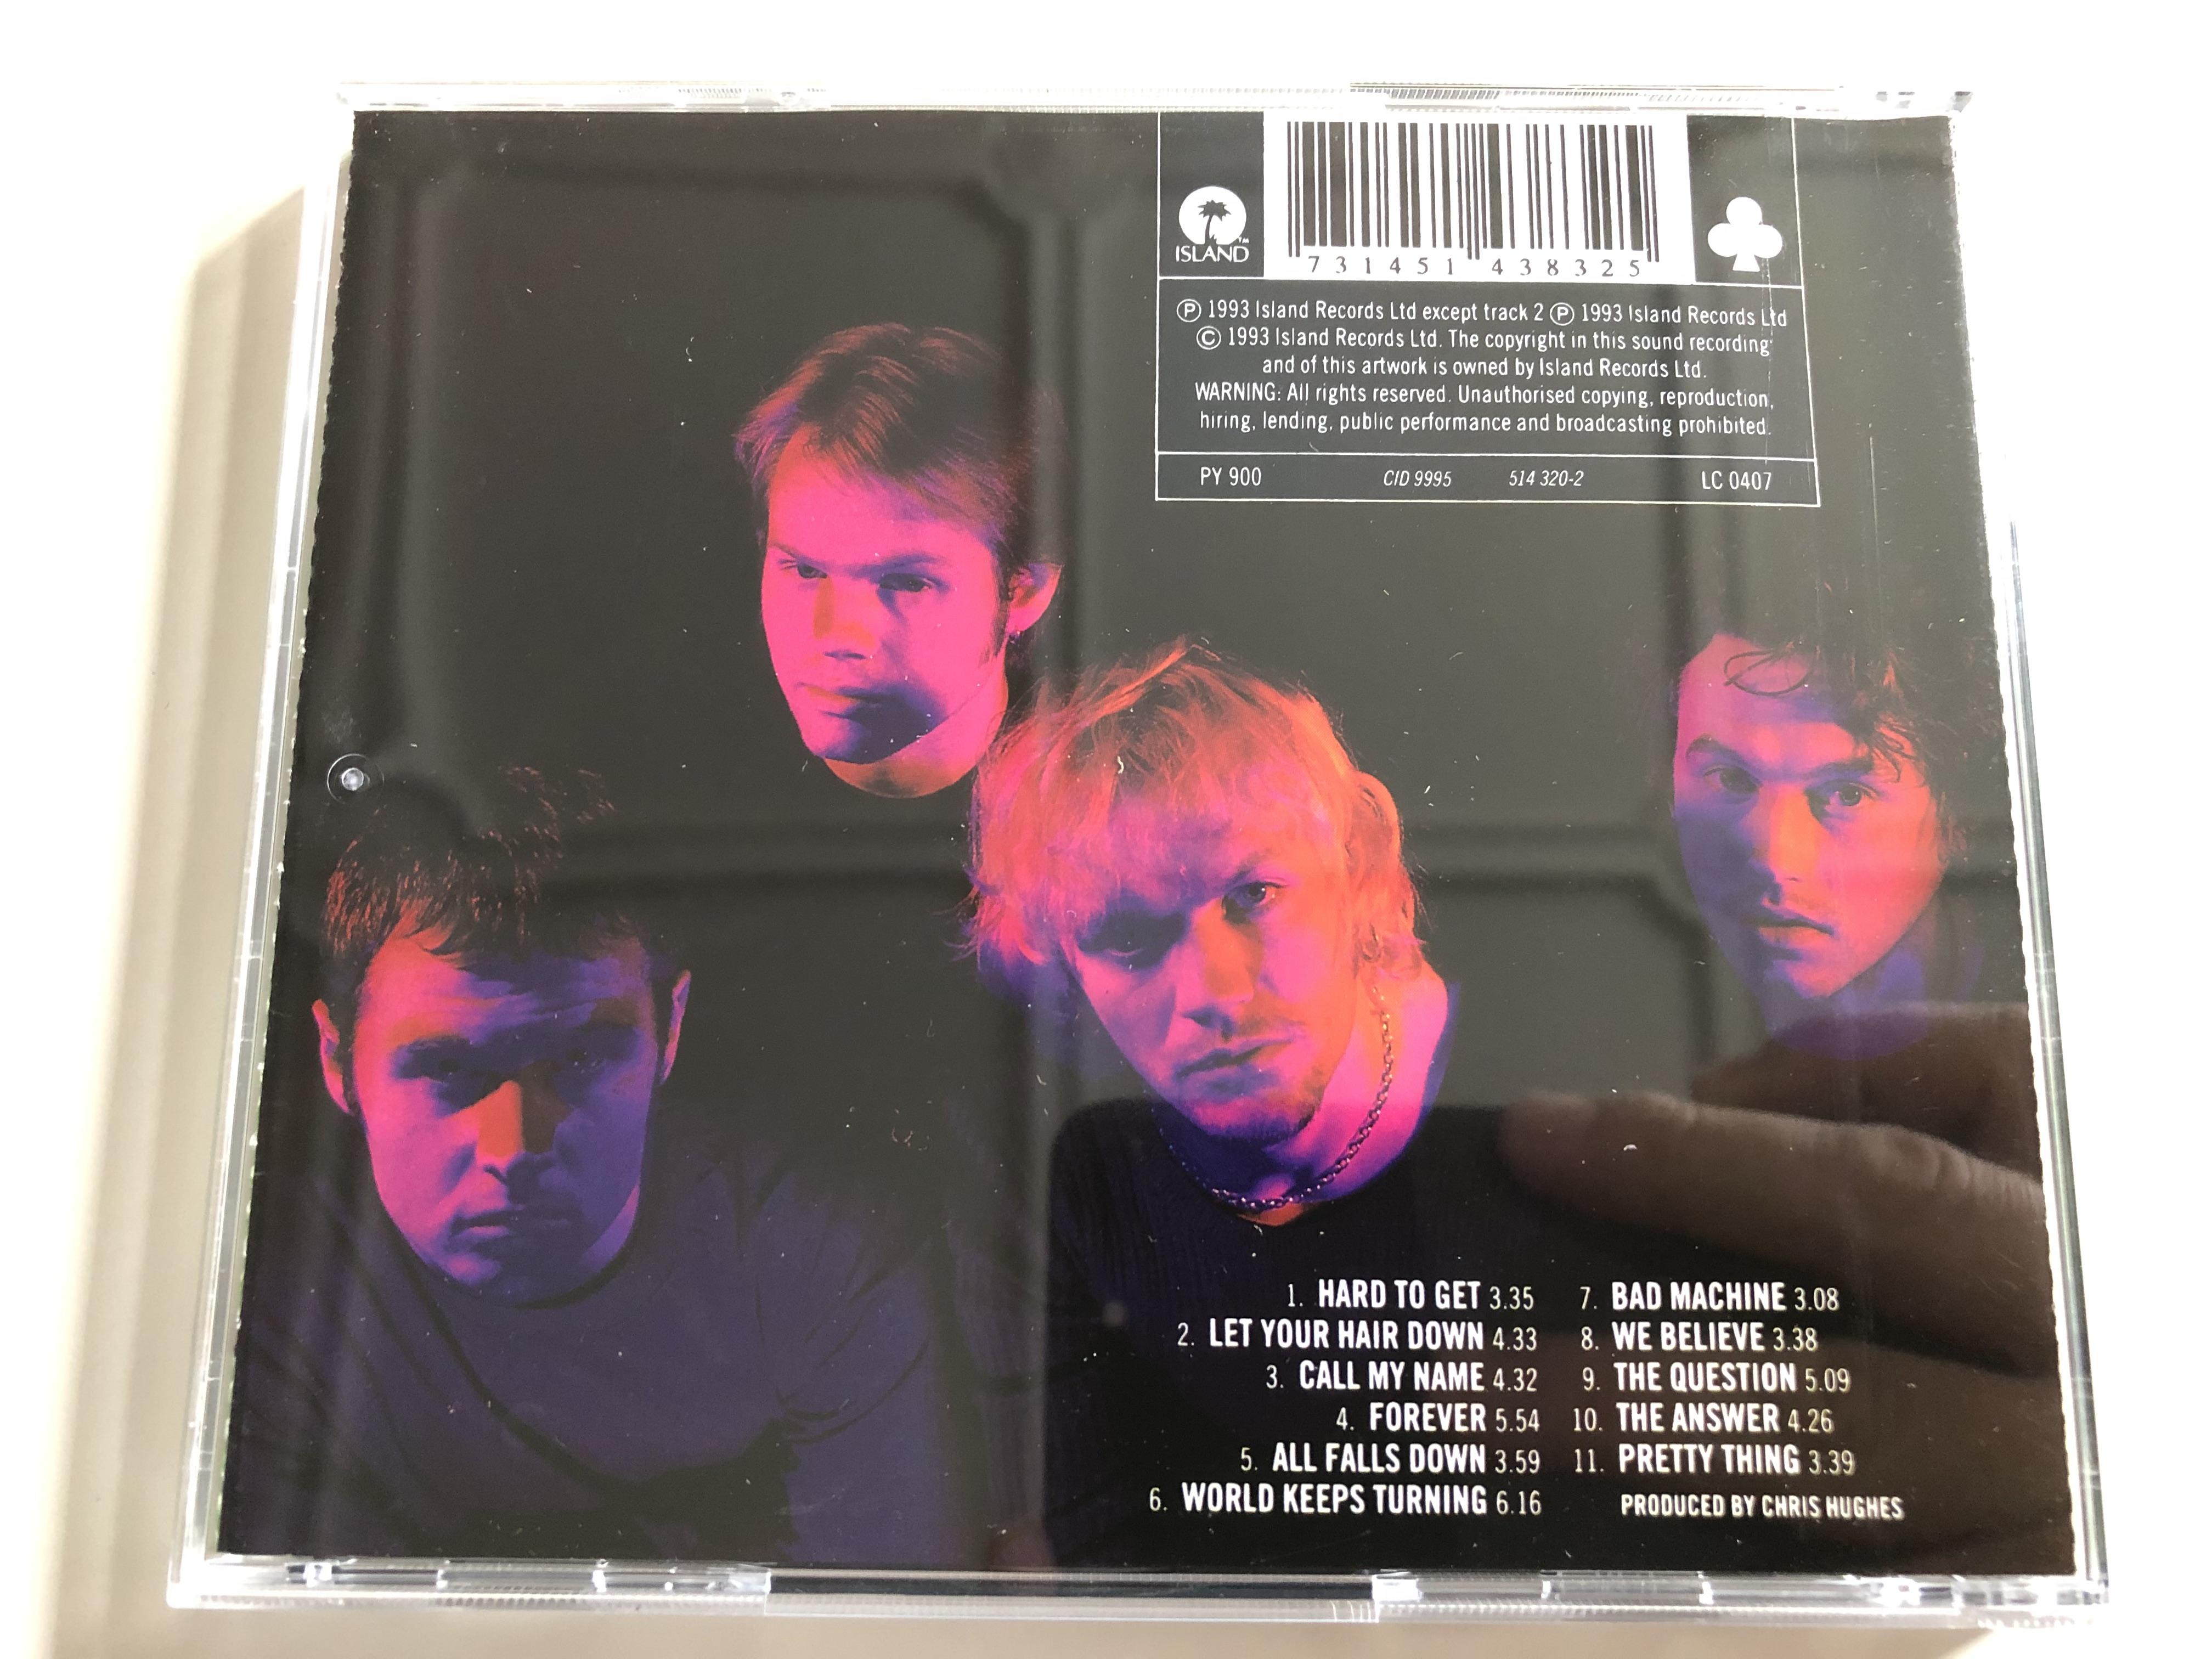 starclub-hard-to-get-bad-machine-we-believe-the-answer-audio-cd-1993-cid9995-7-.jpg